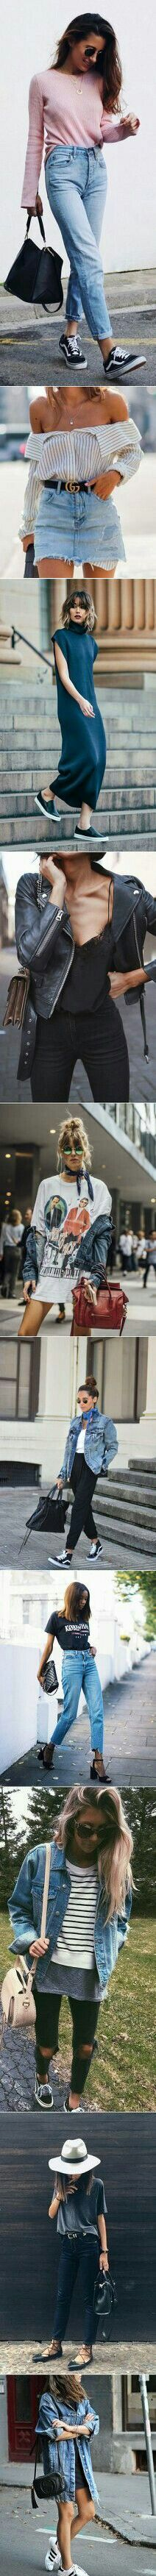 Hottest Street Styles For 2017 #mens #fashion #streetstyle #fashionfallmens